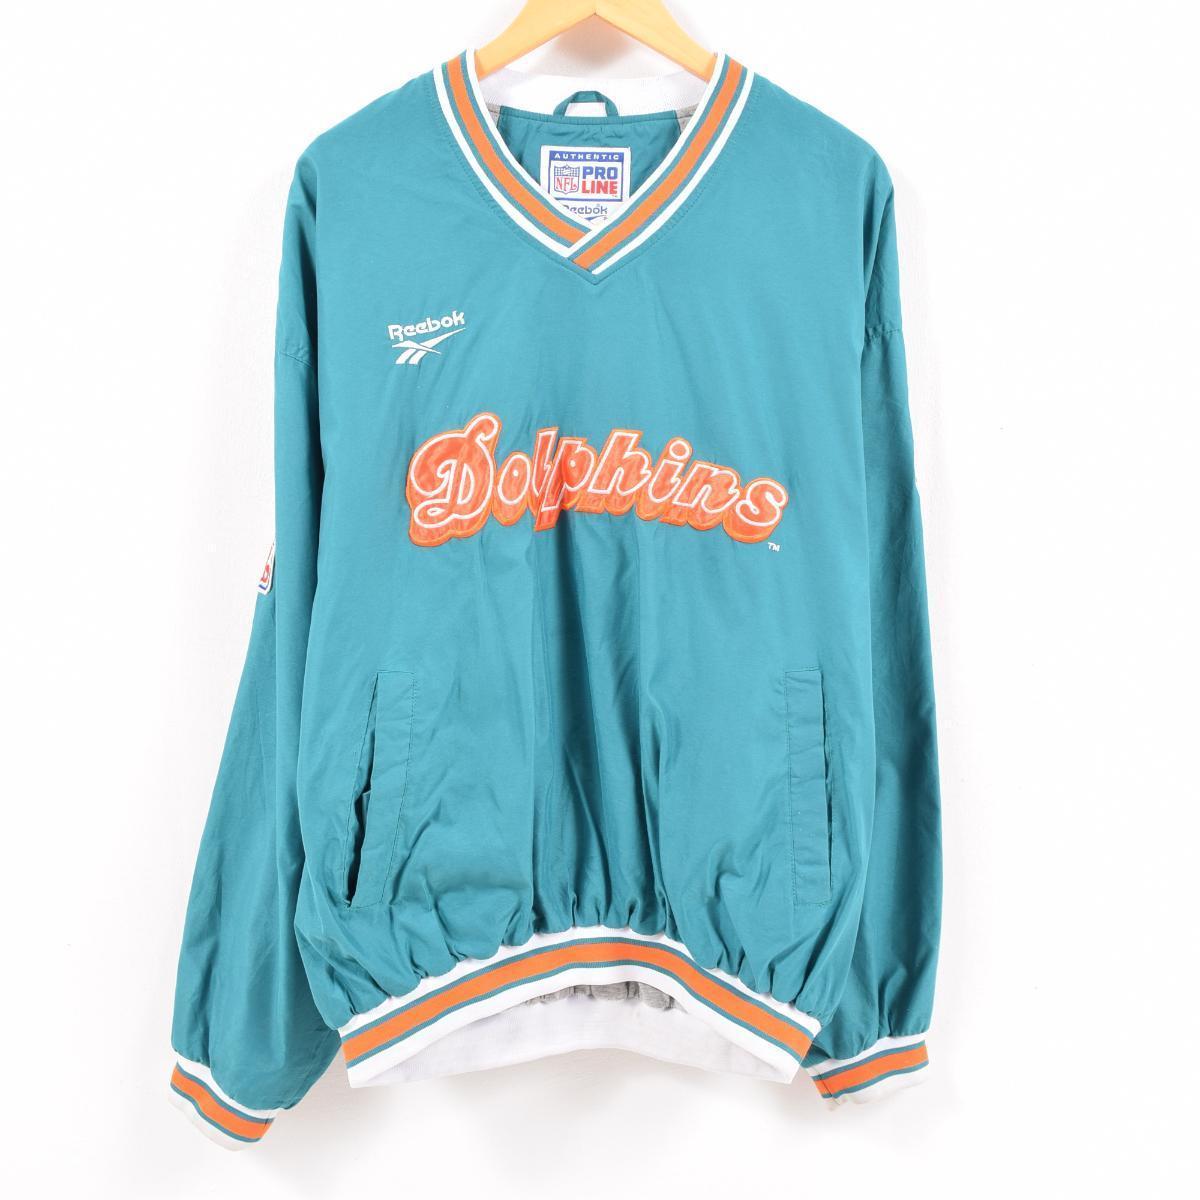 promo code 57aa9 8a552 90s Reebok Reebok NFL MIAMI DOLPHINS Miami Dolphins warm-up pullover men XL  /wbc6455